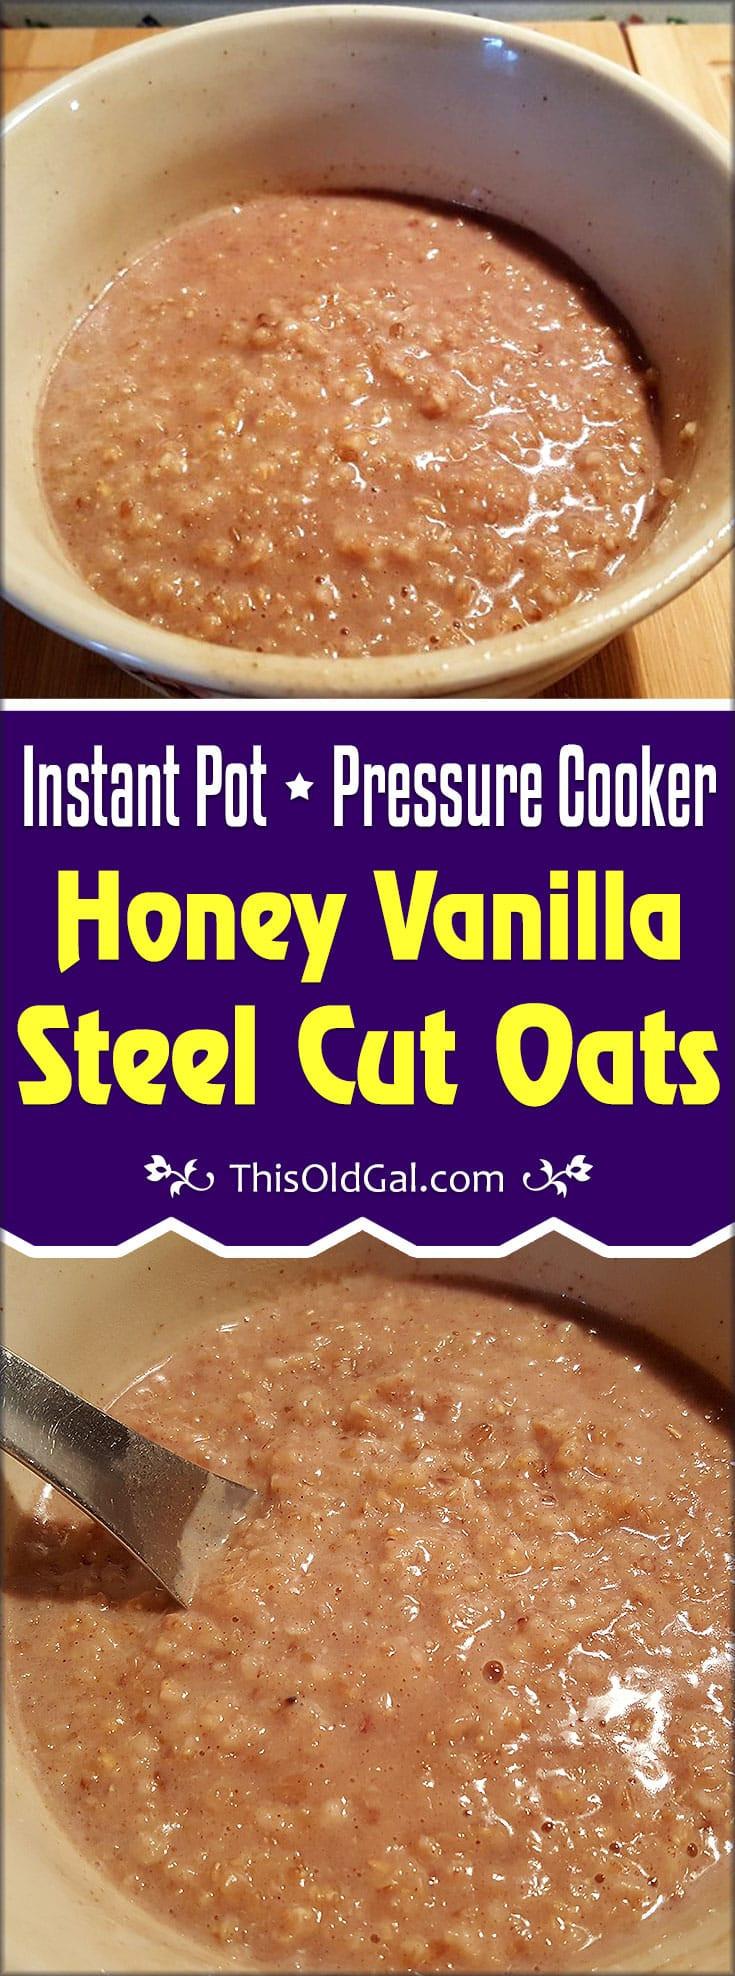 Steel Cut Oats Pressure Cooker  Pressure Cooker Honey Vanilla Steel Cut Oats